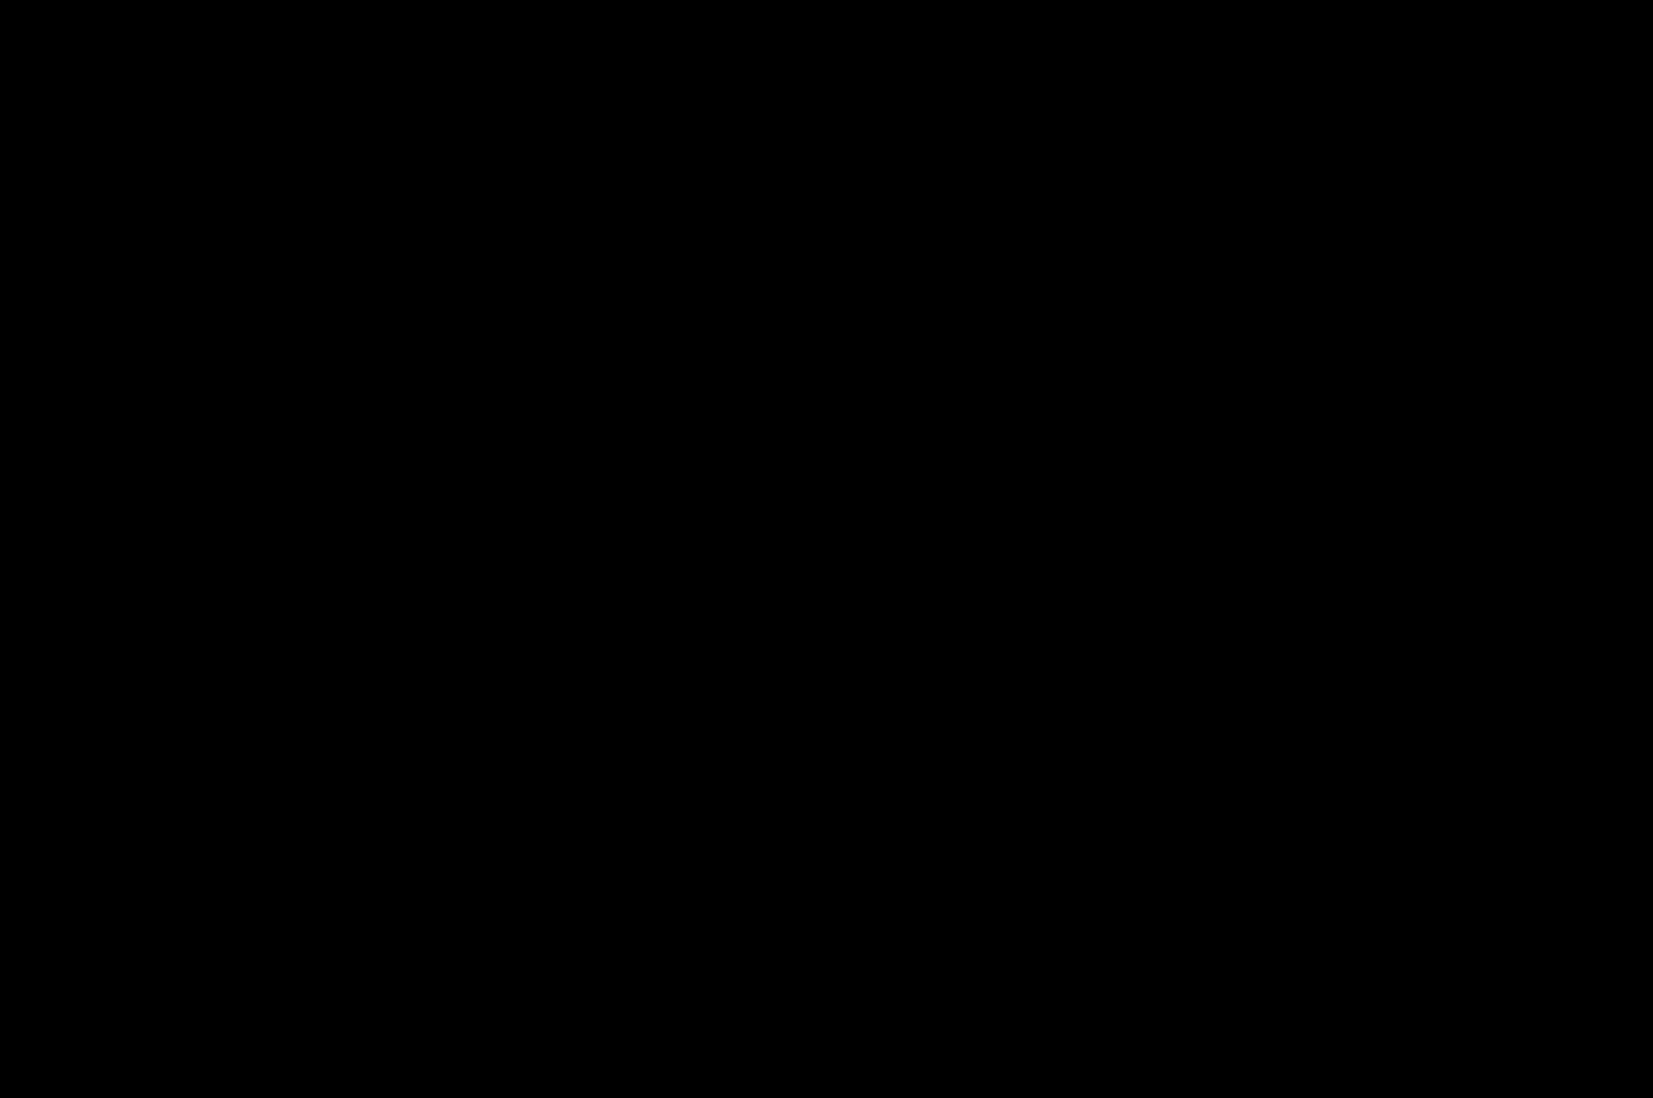 A blank coordinate plane.